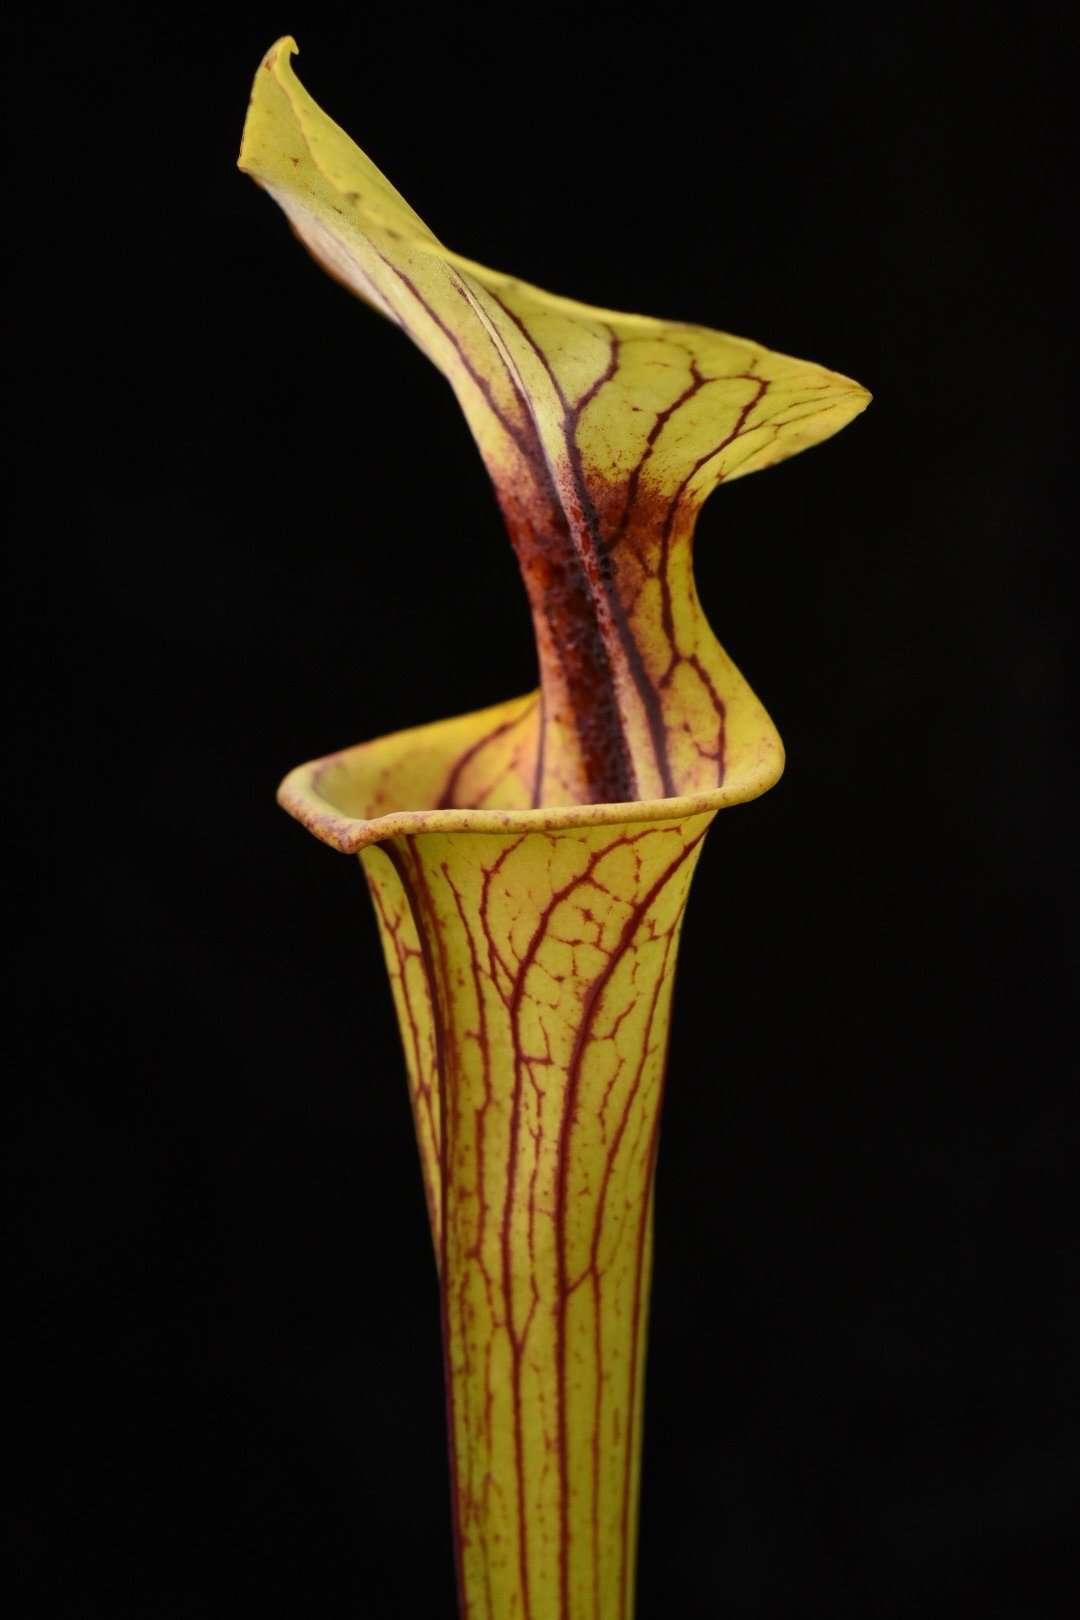 Sarracenia flava Extreme Red Throat Bay Co FL Mike W.